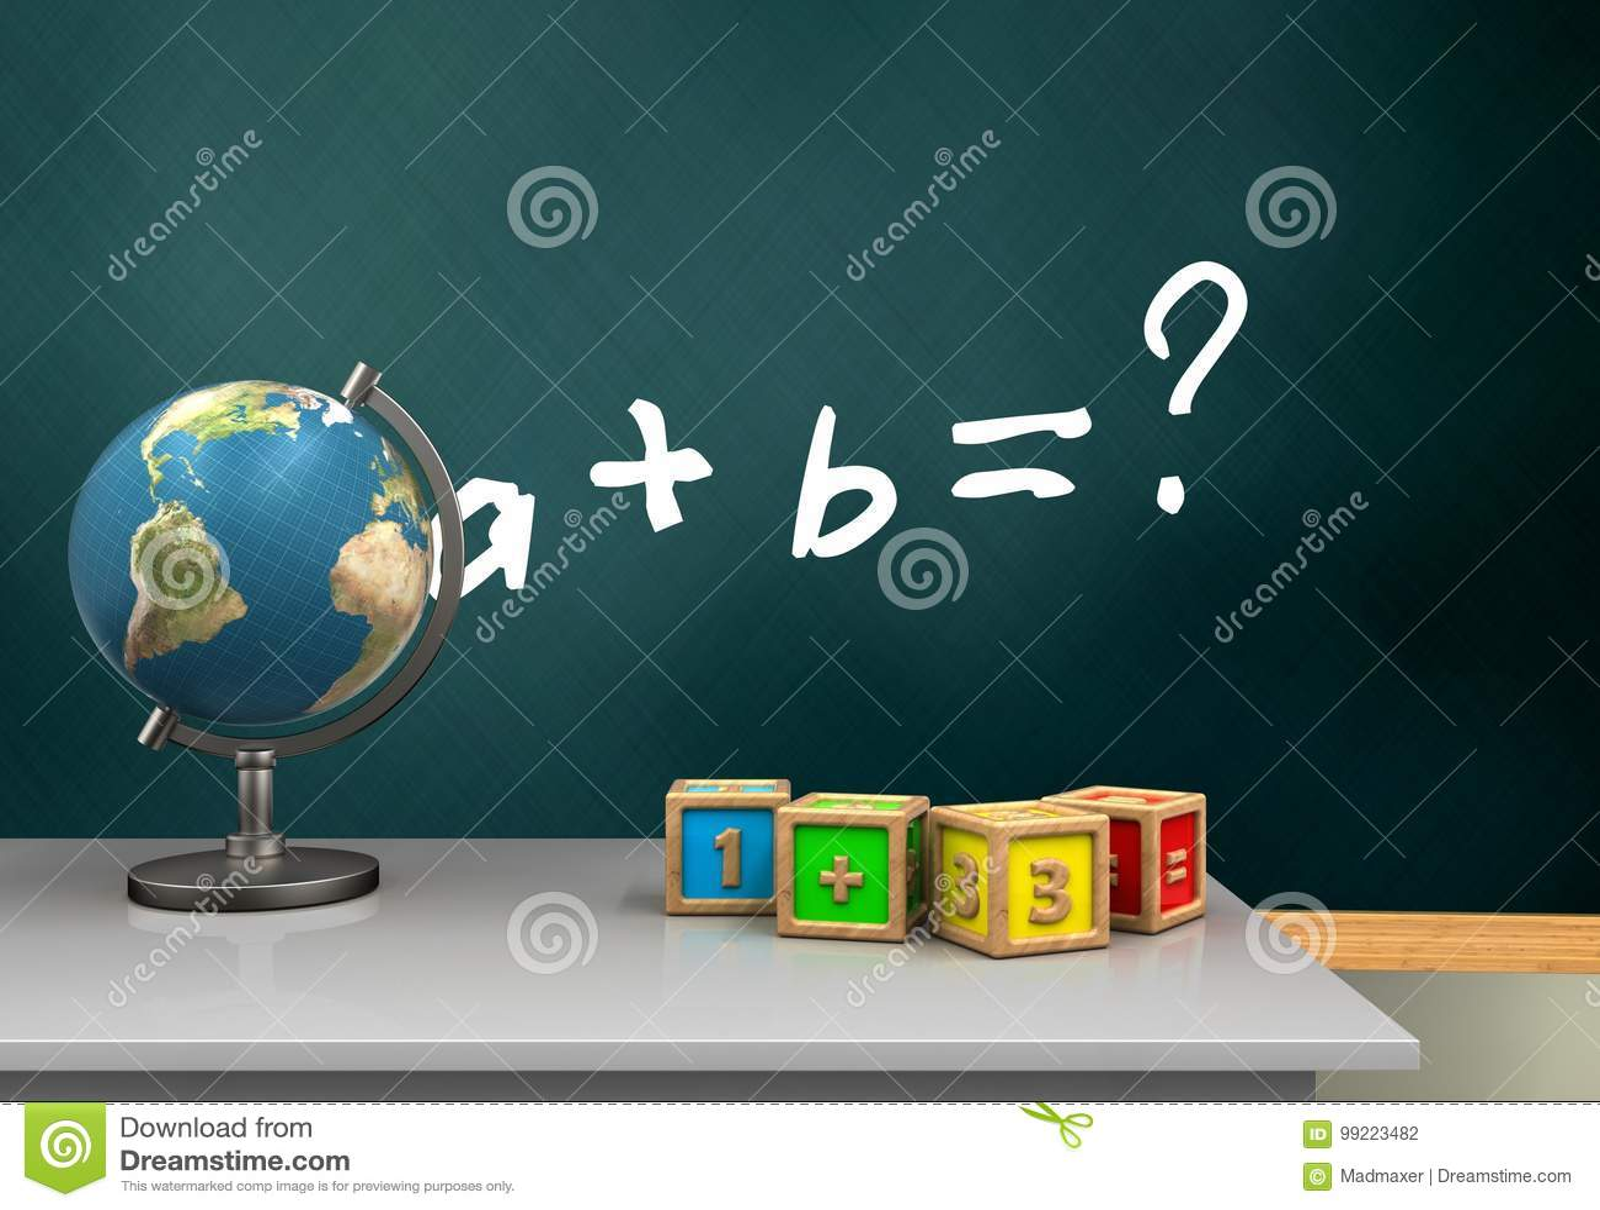 3d math cubes stock illustration. Illustration of algebra - 99223482